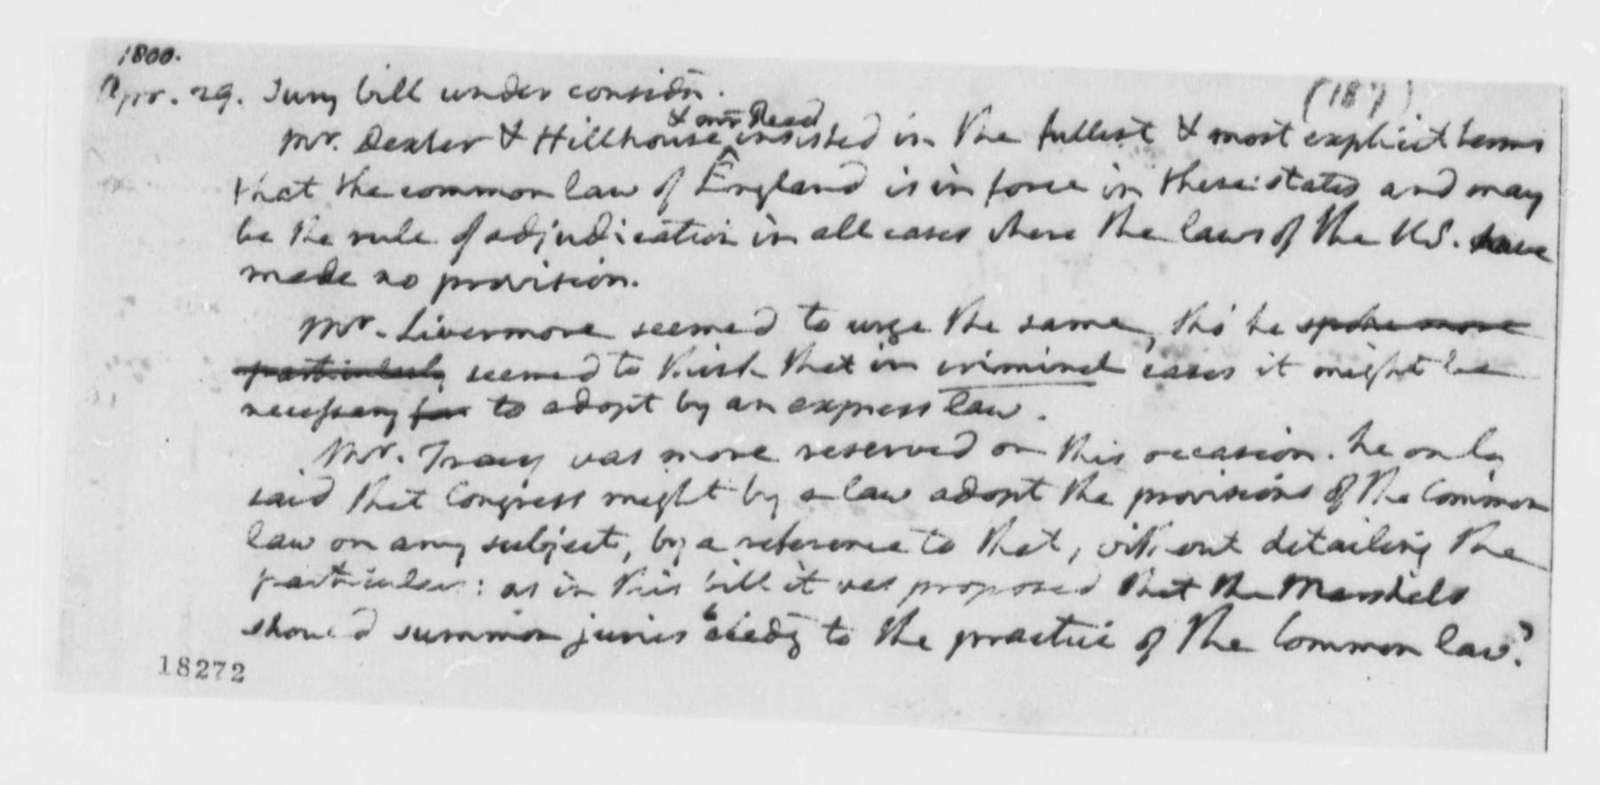 Thomas Jefferson, April 29, 1800, Notes on Common Law